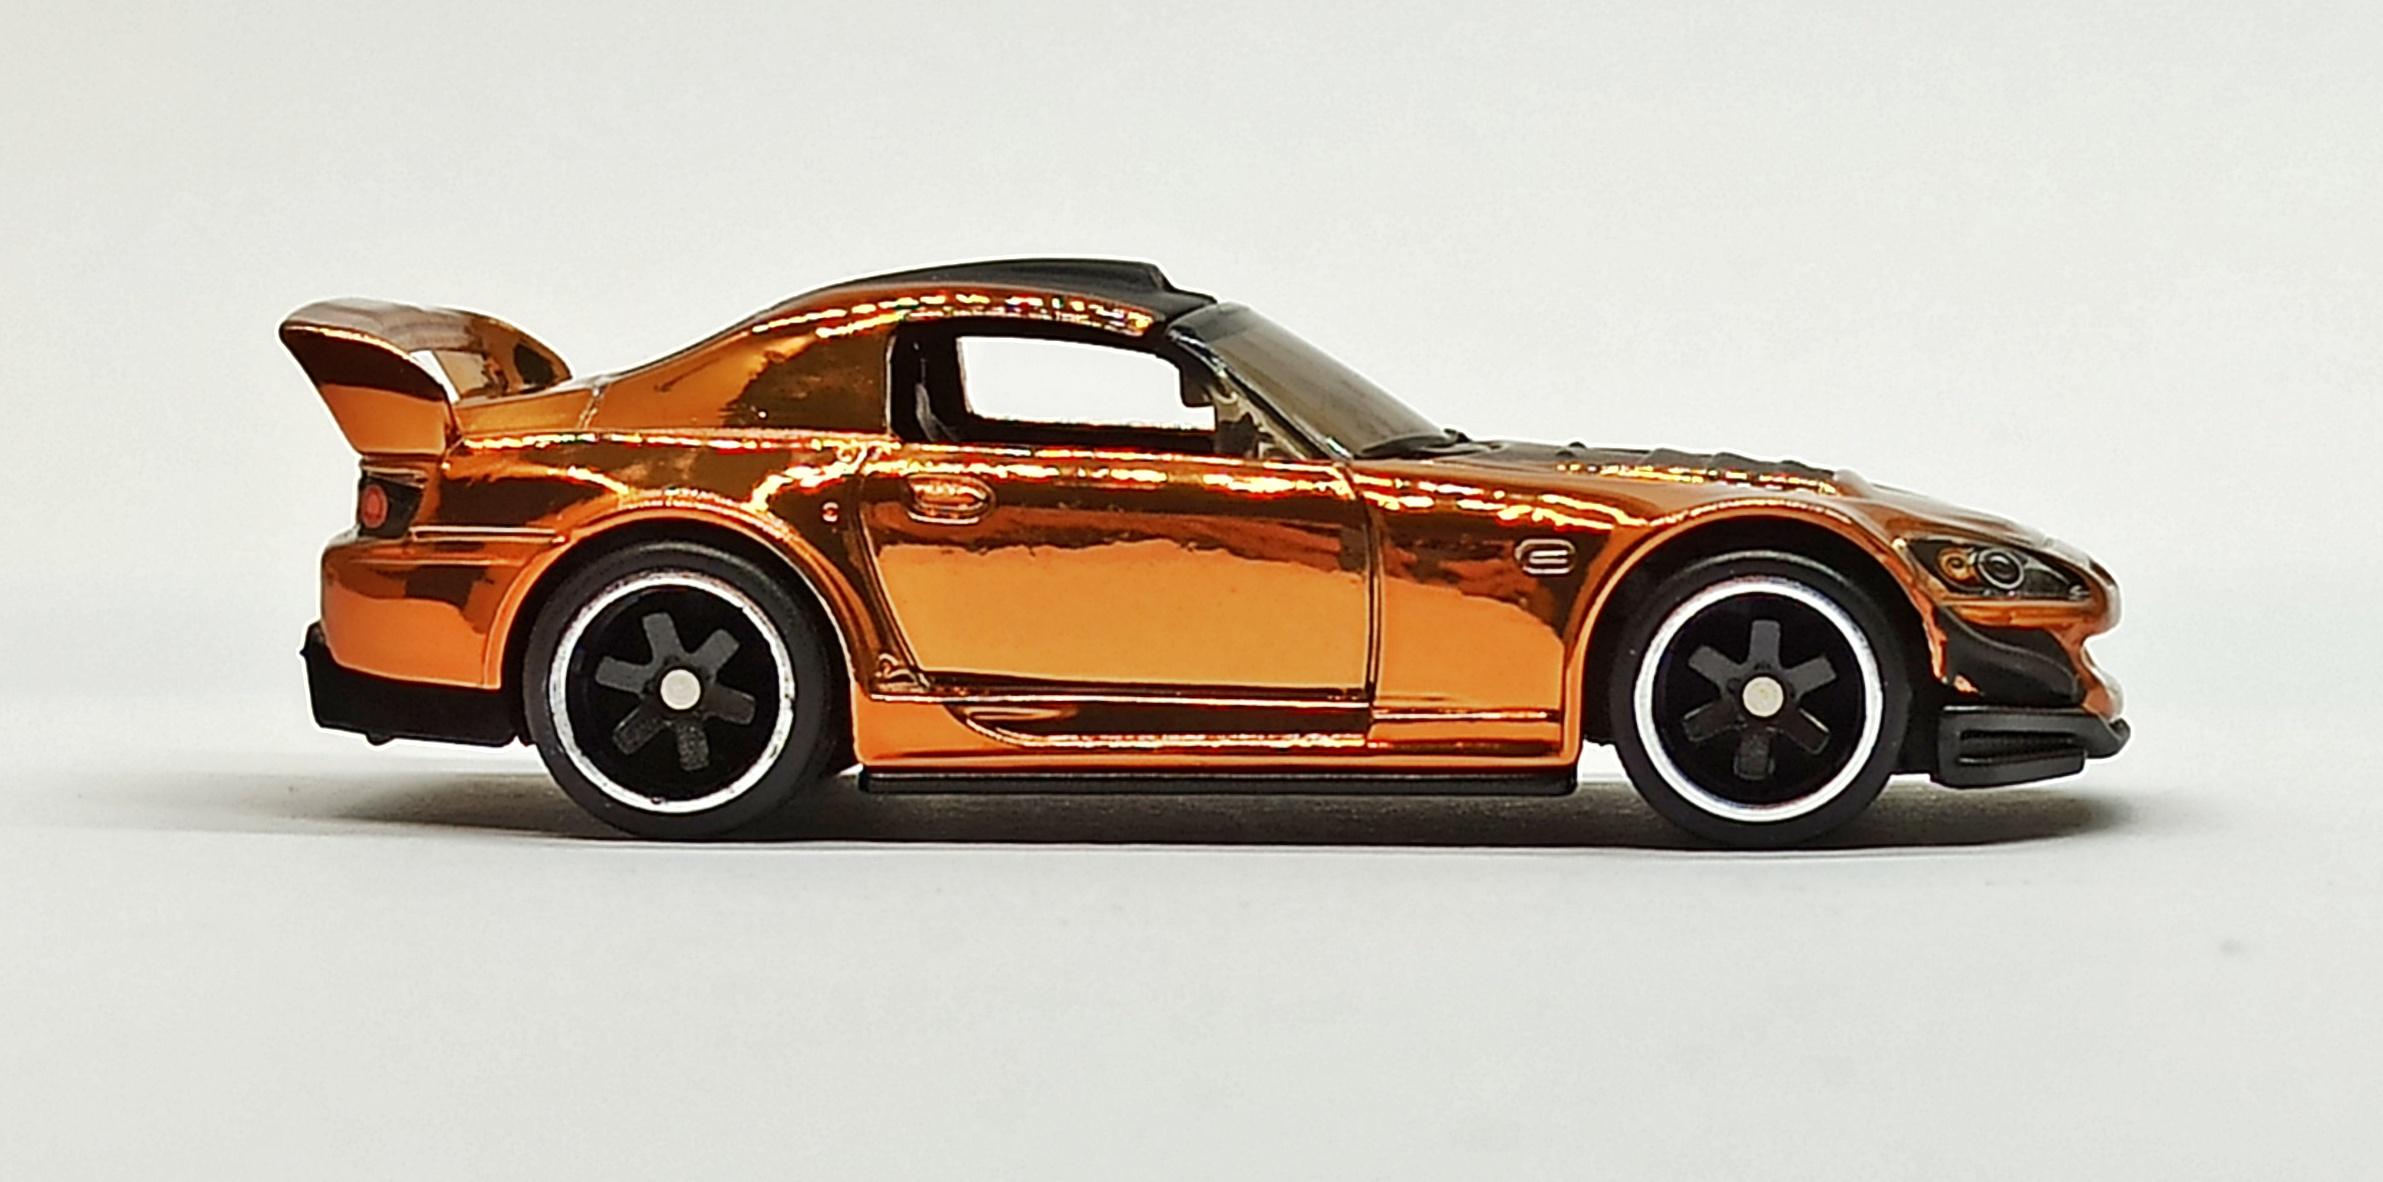 Hot Wheels Honda S2000 2019 RLC Exclusive (1 of 10.000) spectraflame orange side